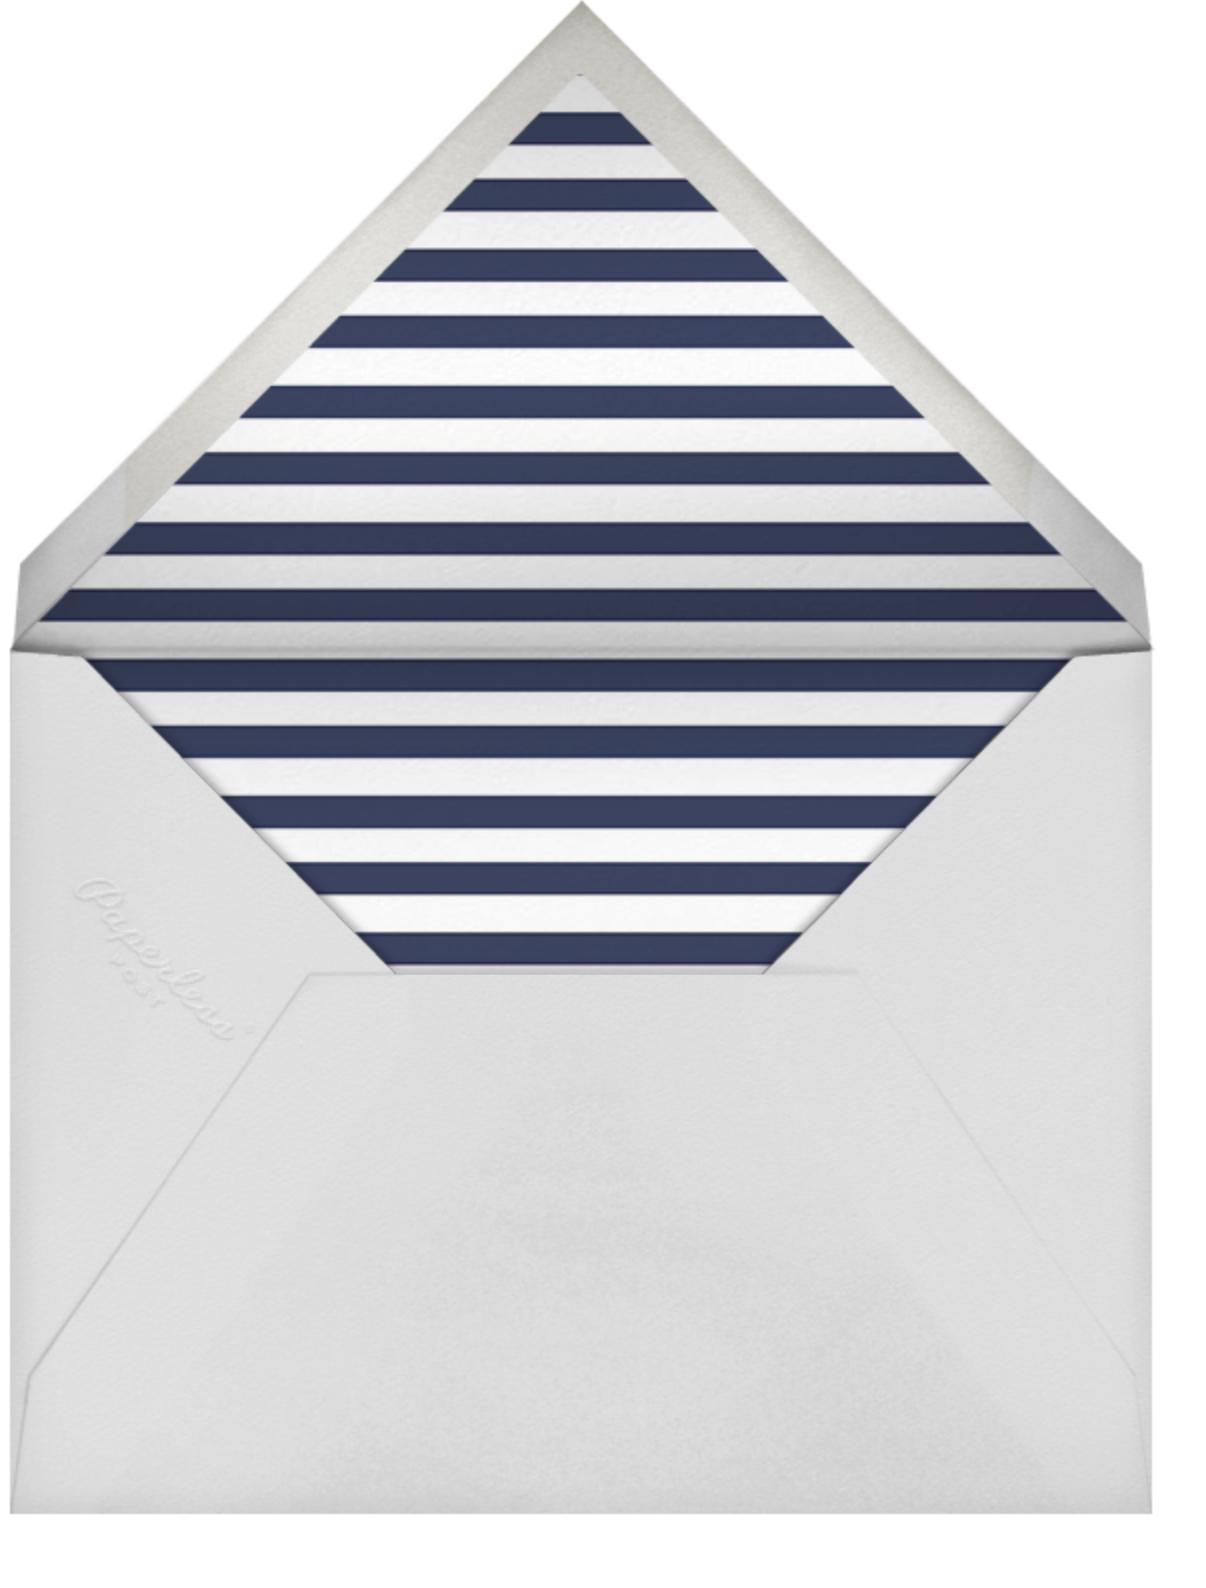 Confetti - Navy/Rose Gold - kate spade new york - Envelope